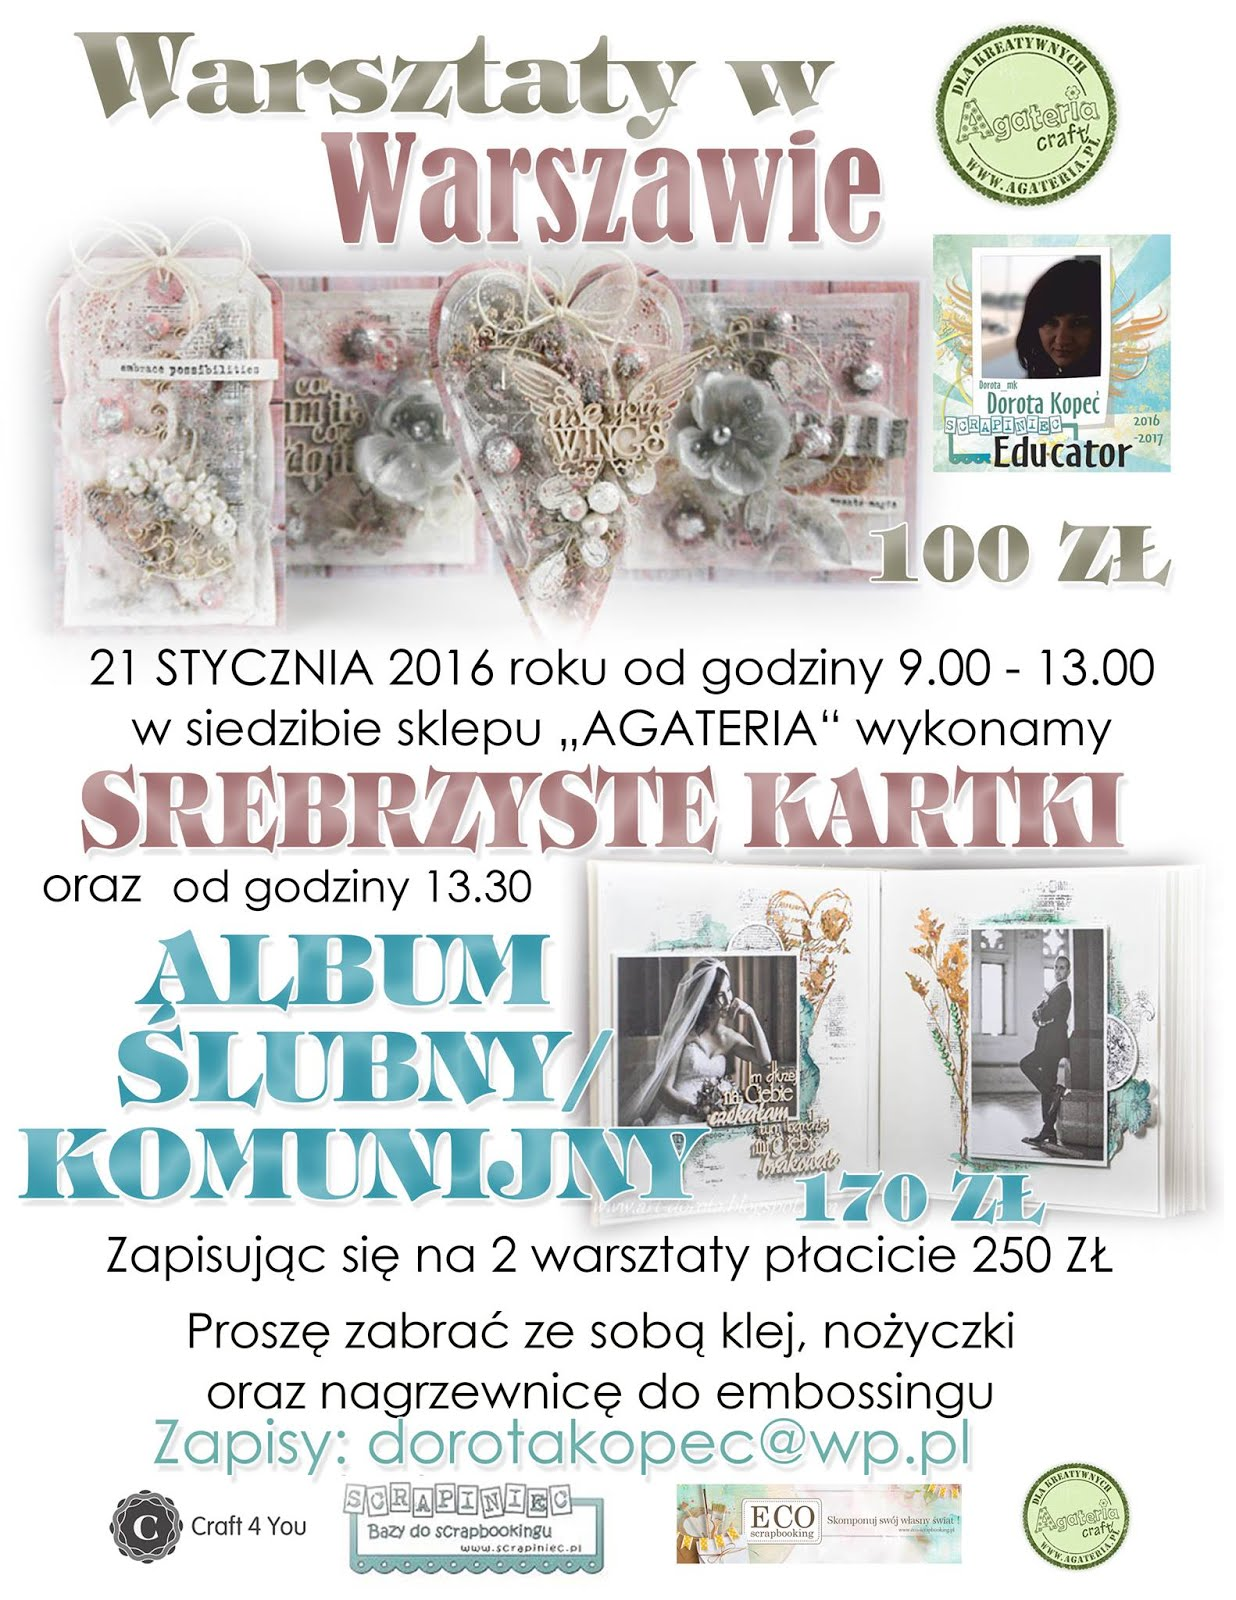 Warszawa Agateria 21.01.2017